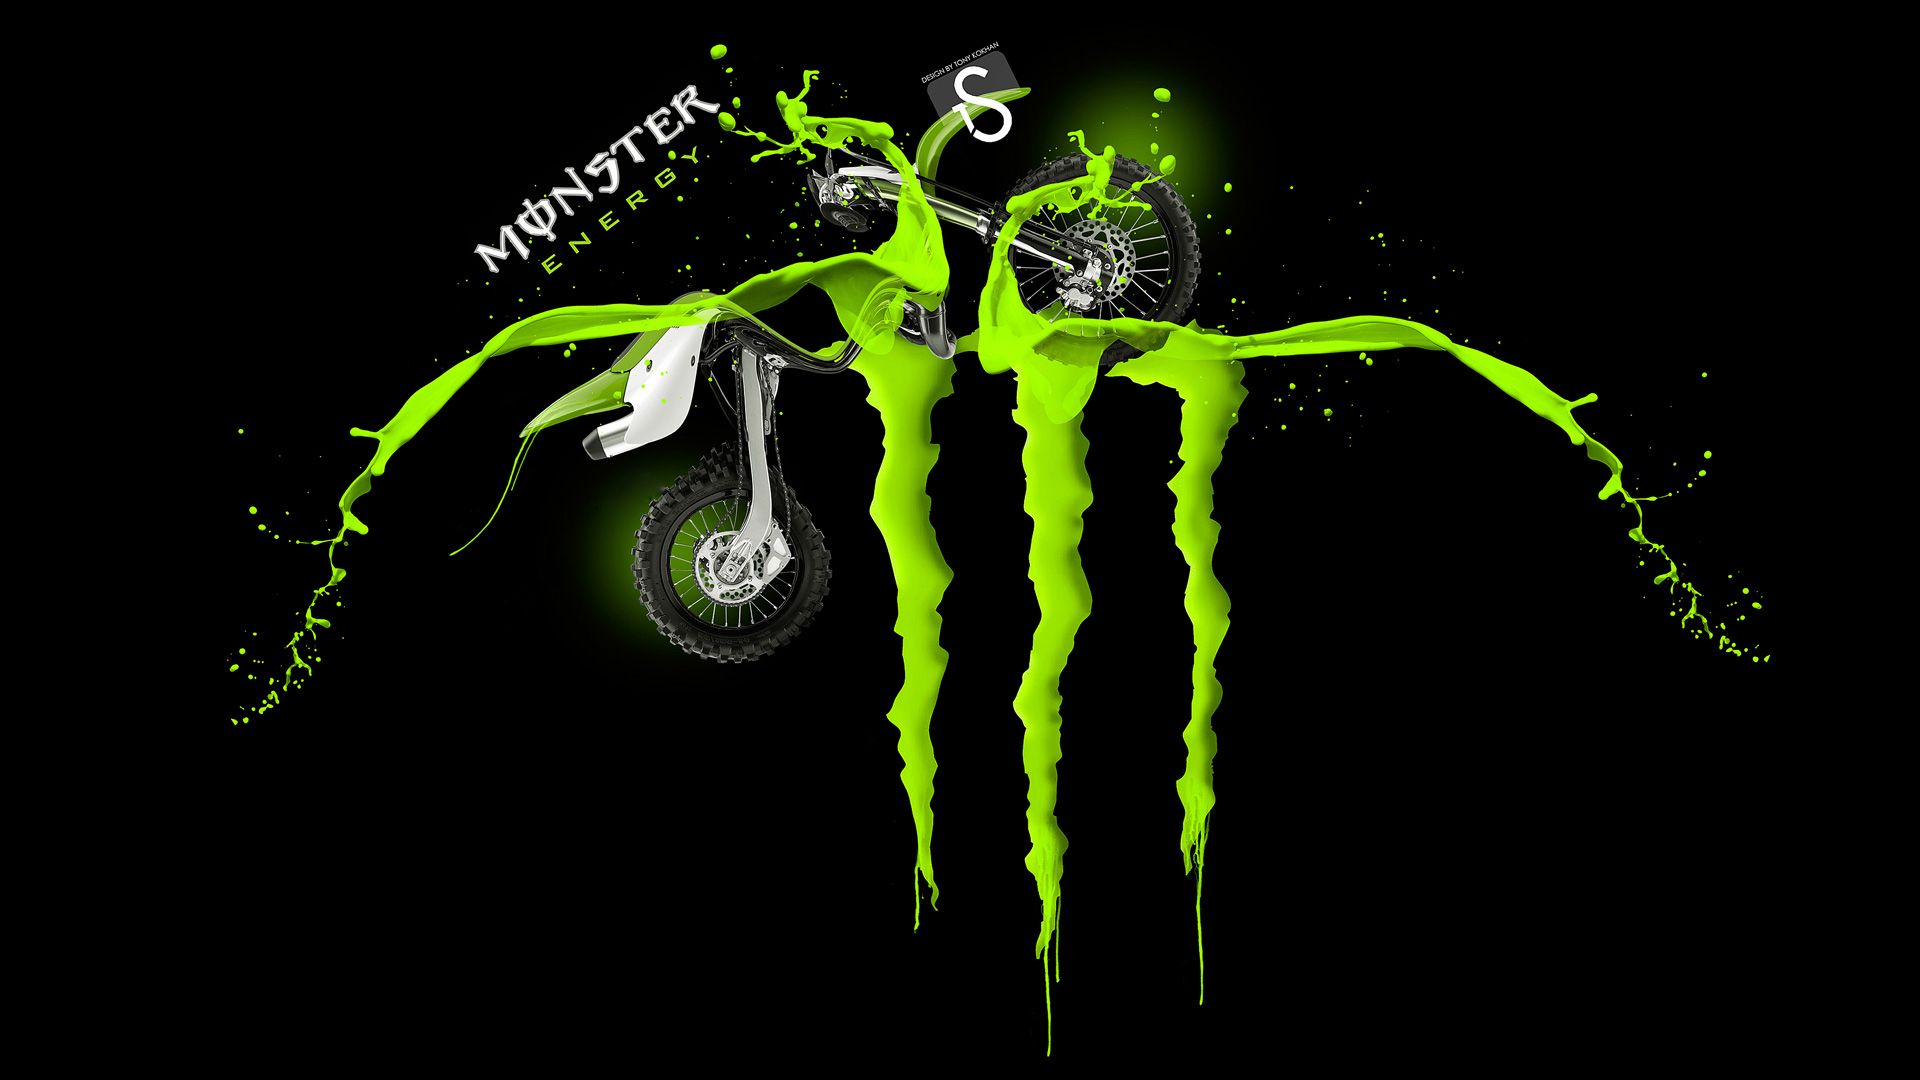 HD Monster Wallpapers HD Monster Wallpapers Download Free